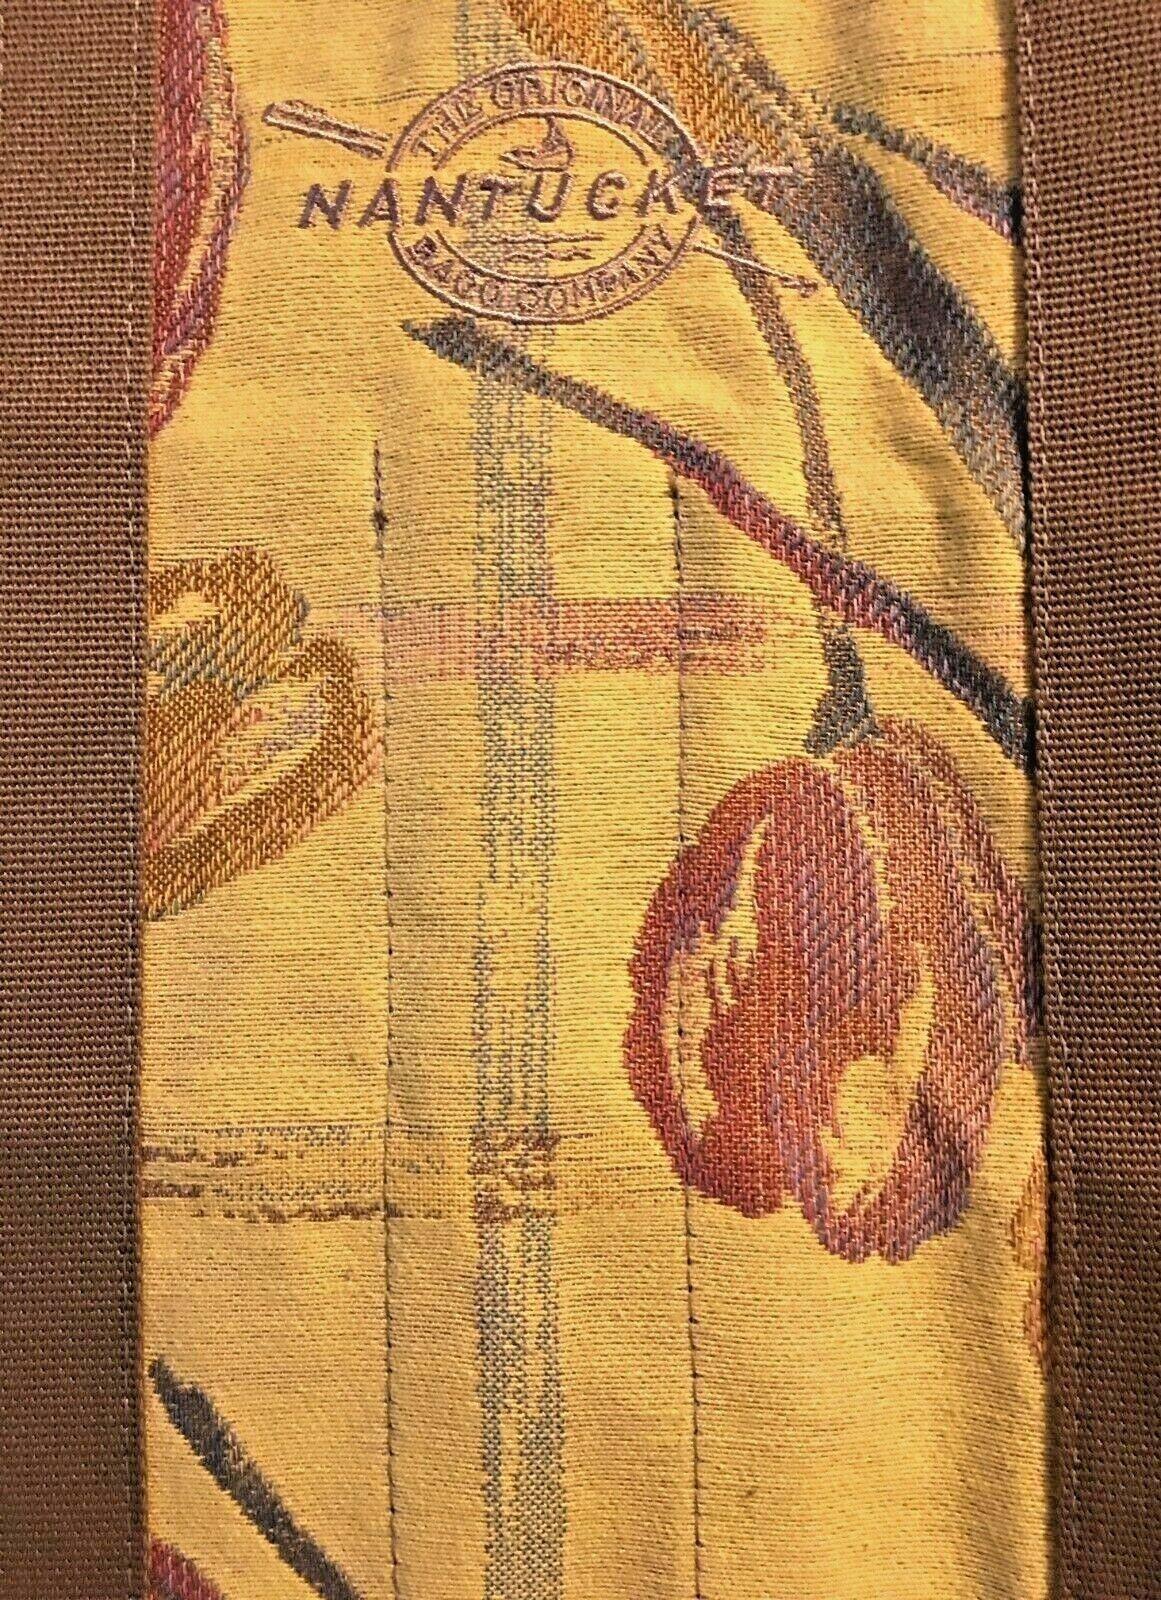 Knitting Bag Tote,Travel Bag SPECIAL $$$ OCEANS Nantucket Bag,Tapestry